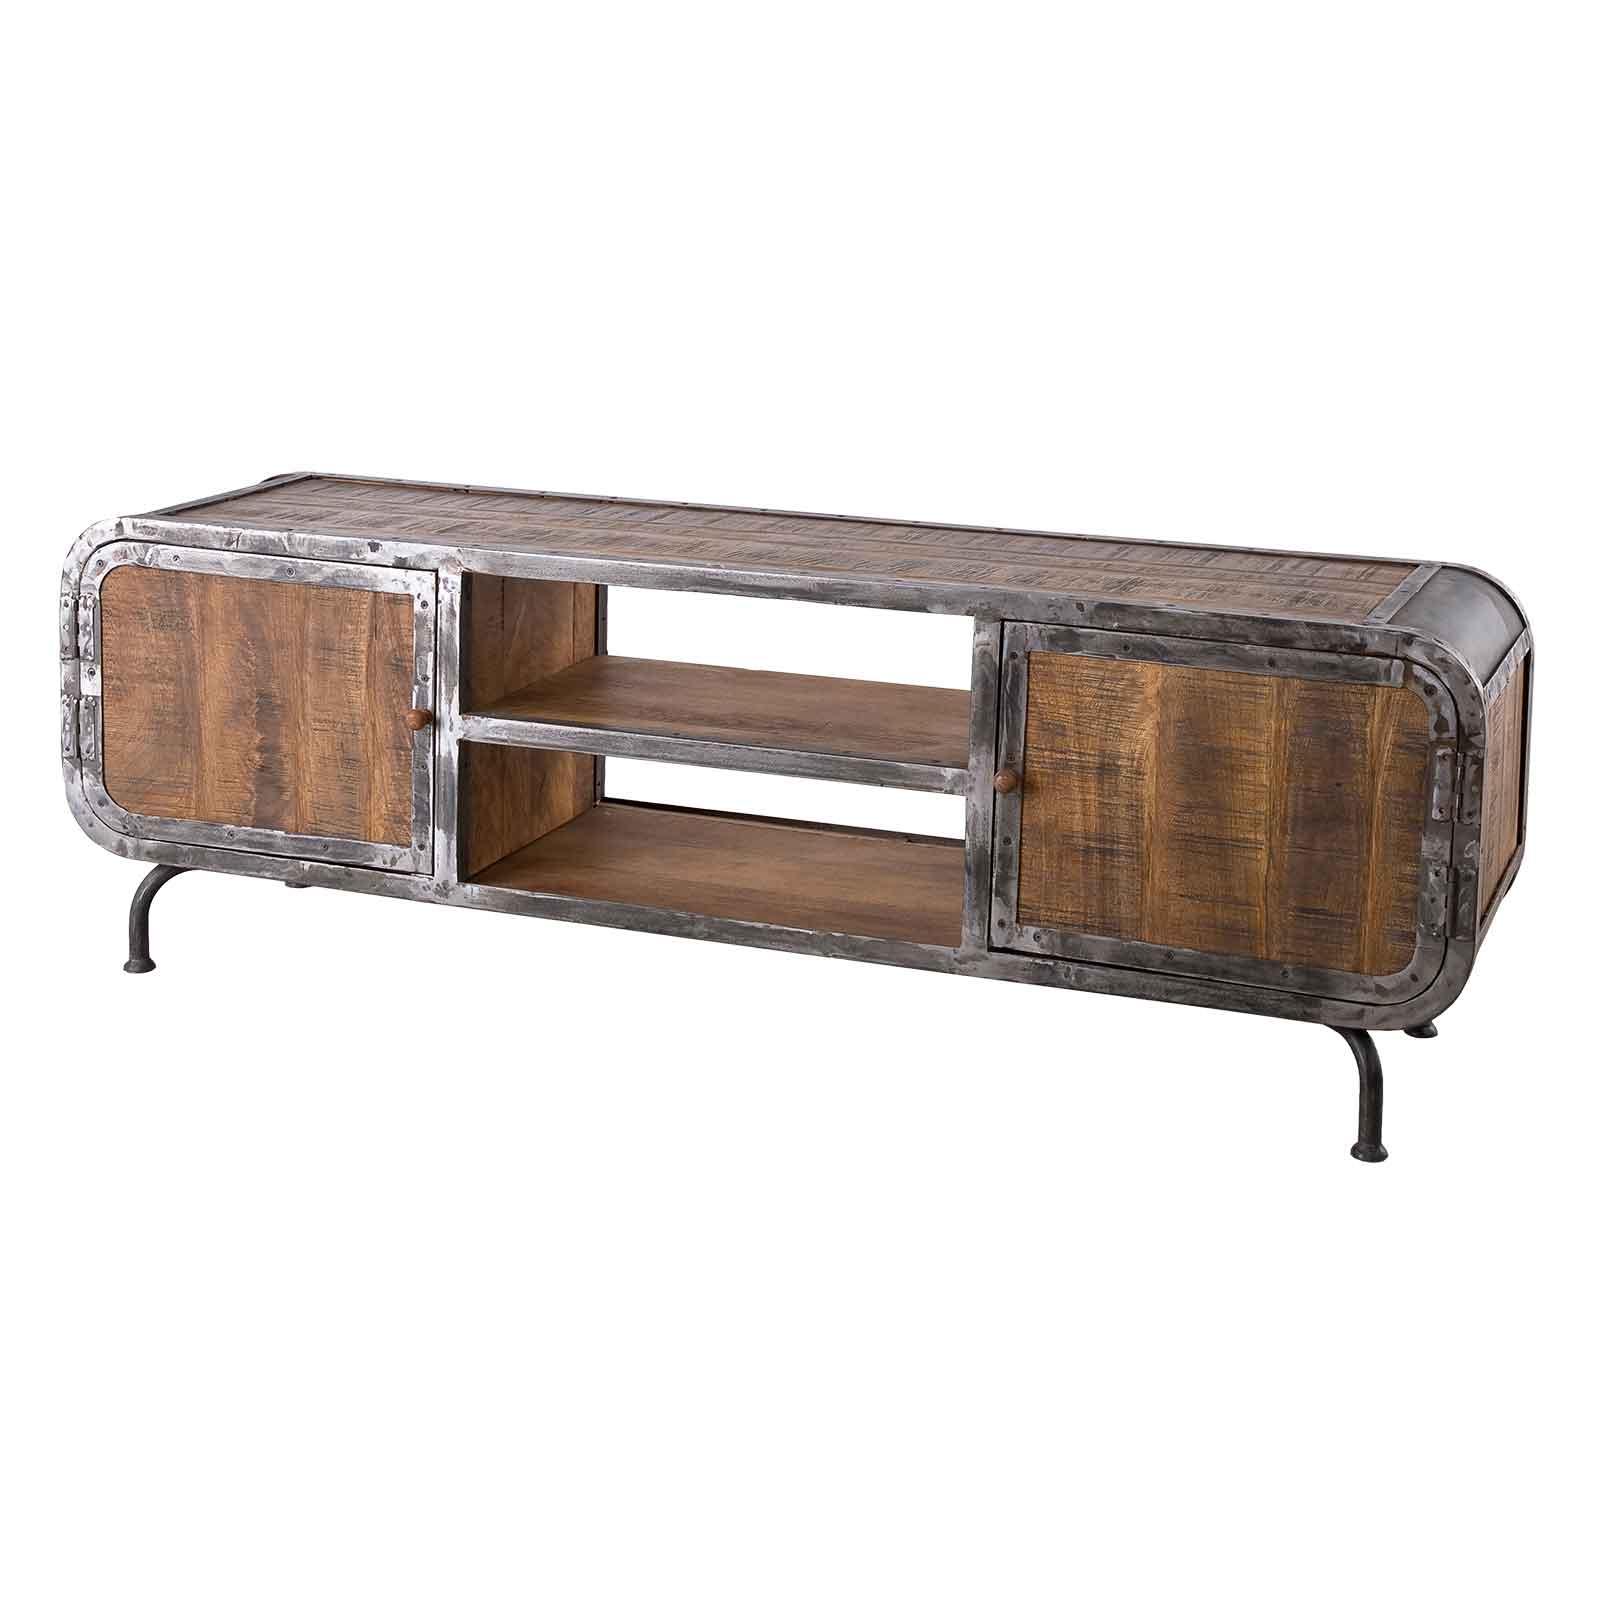 Lowboard Saigon aus Mangoholz und Metall 180 x 60 cm